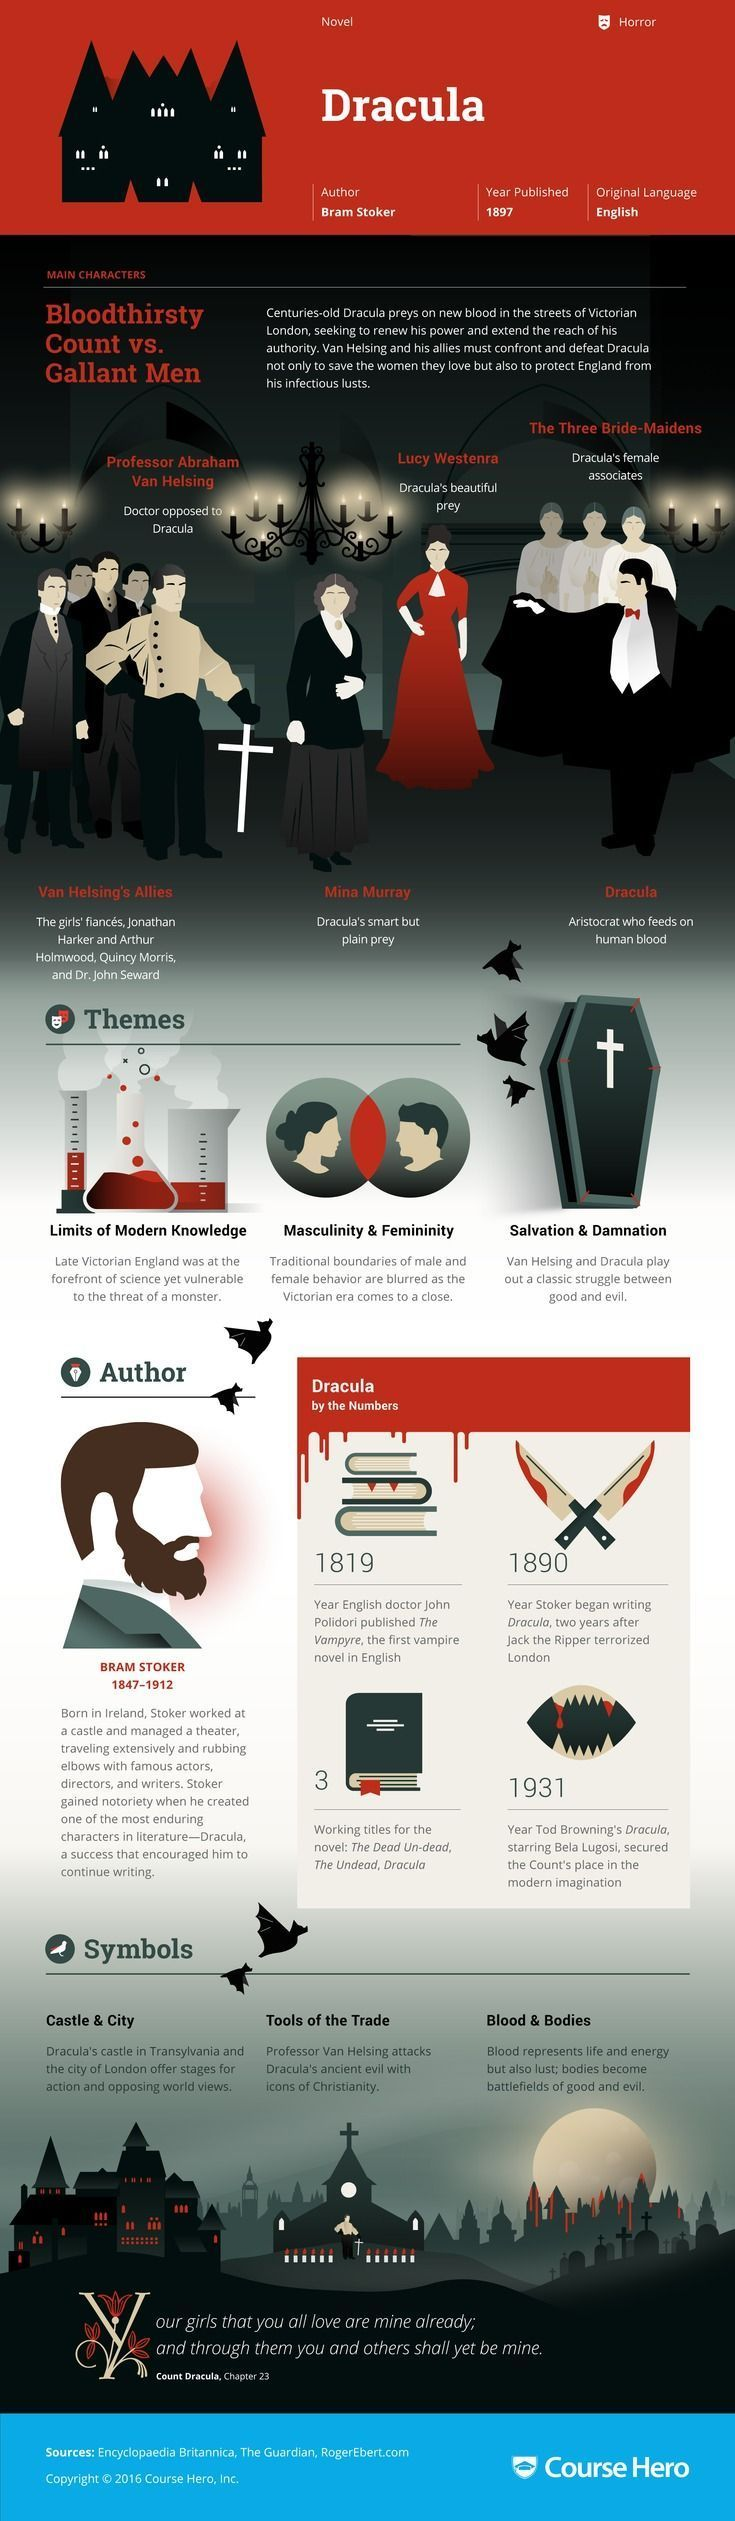 Dracula Infographic   Course Hero